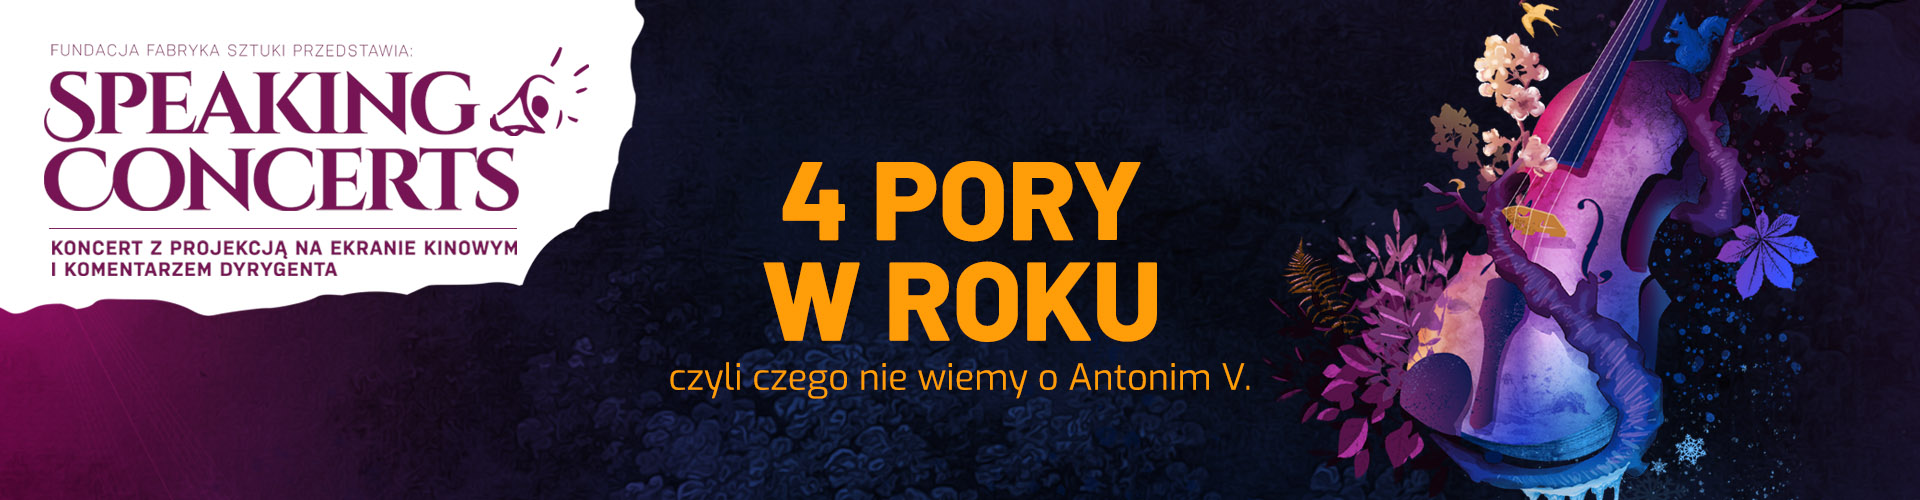 Cztery Pory Roku - Vivaldi - Speaking Concerts - ICE Kraków